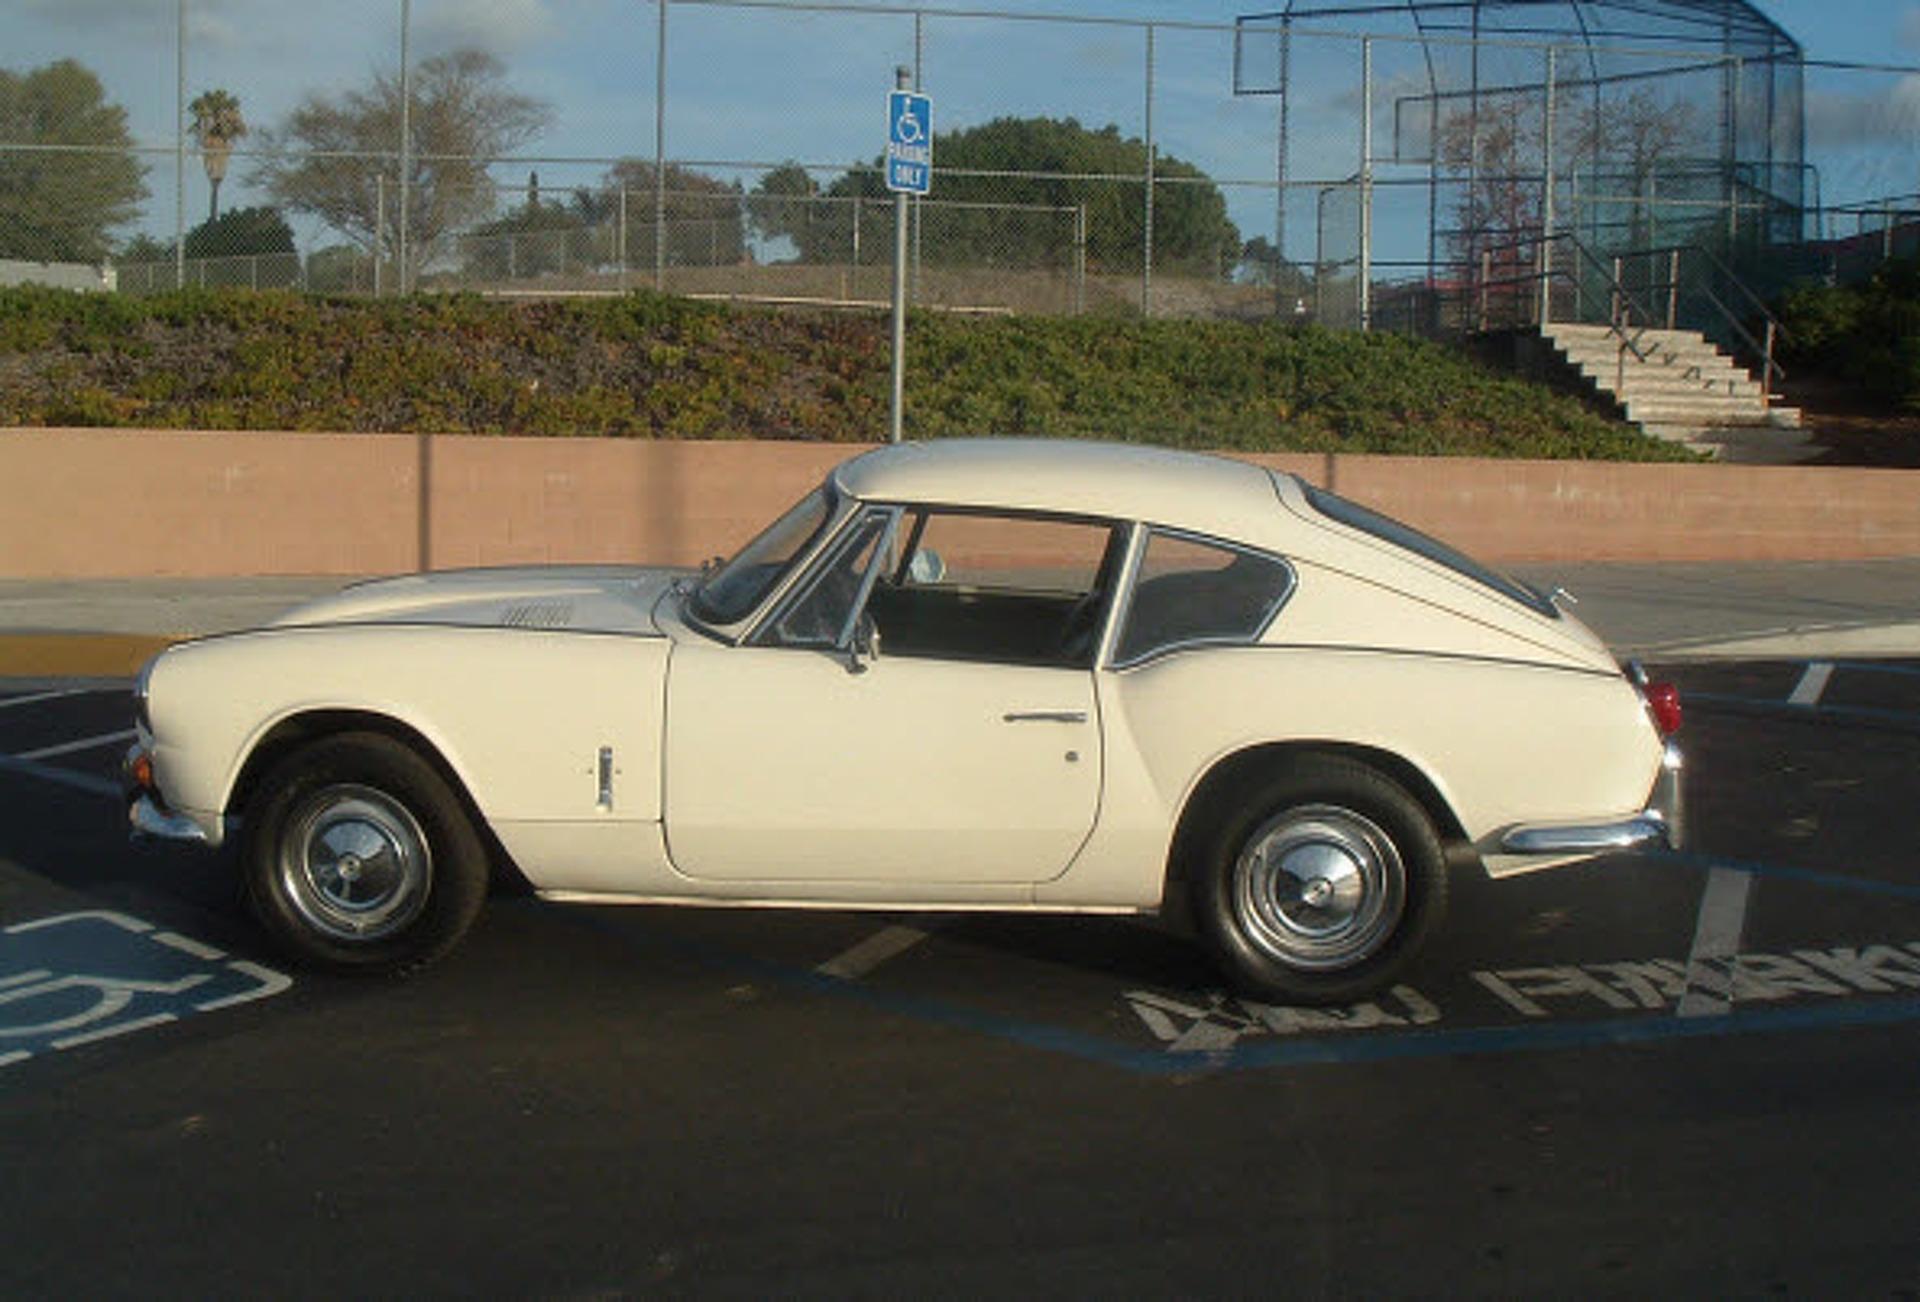 Ebay Car Of The Week 1968 Triumph Gt6 Mk1 Motor1 Com Photos